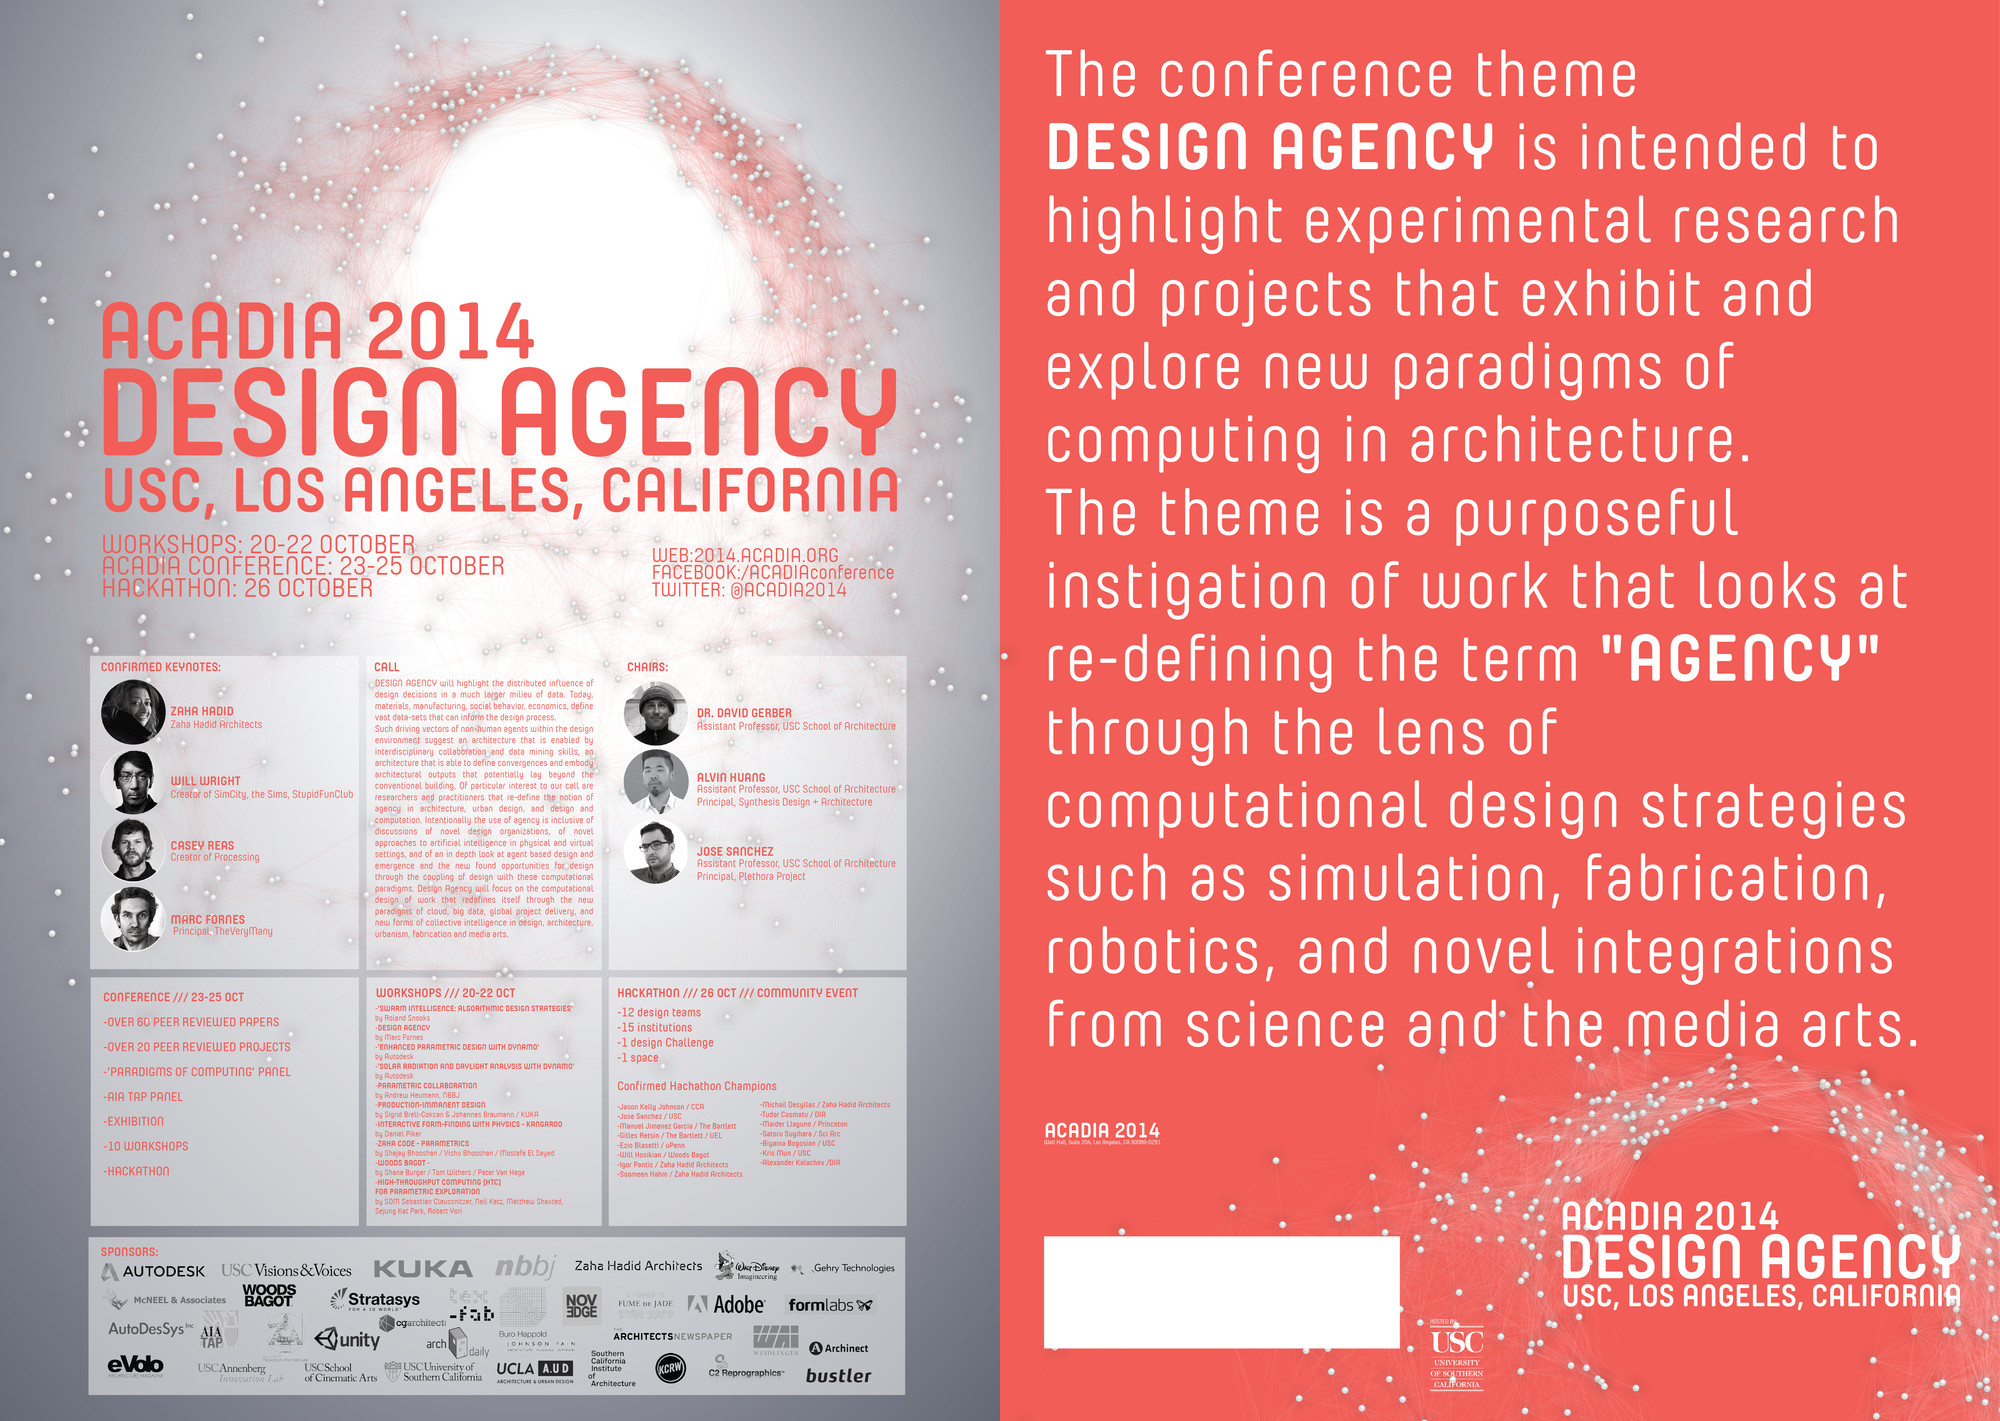 © USC School of Architecture